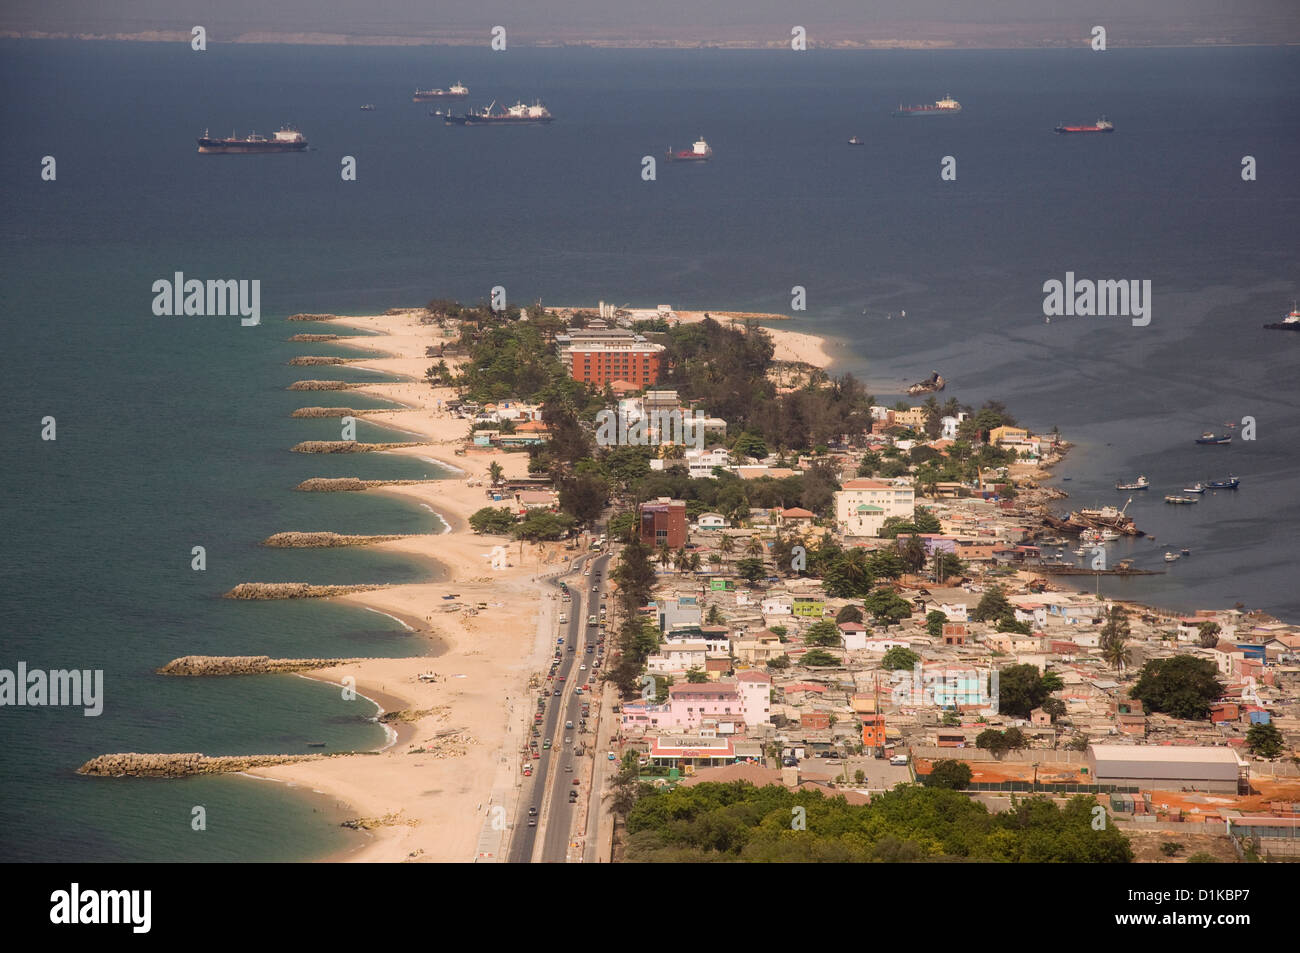 Aerial view of Ilha de Luanda, Luanda Angola. Stock Photo